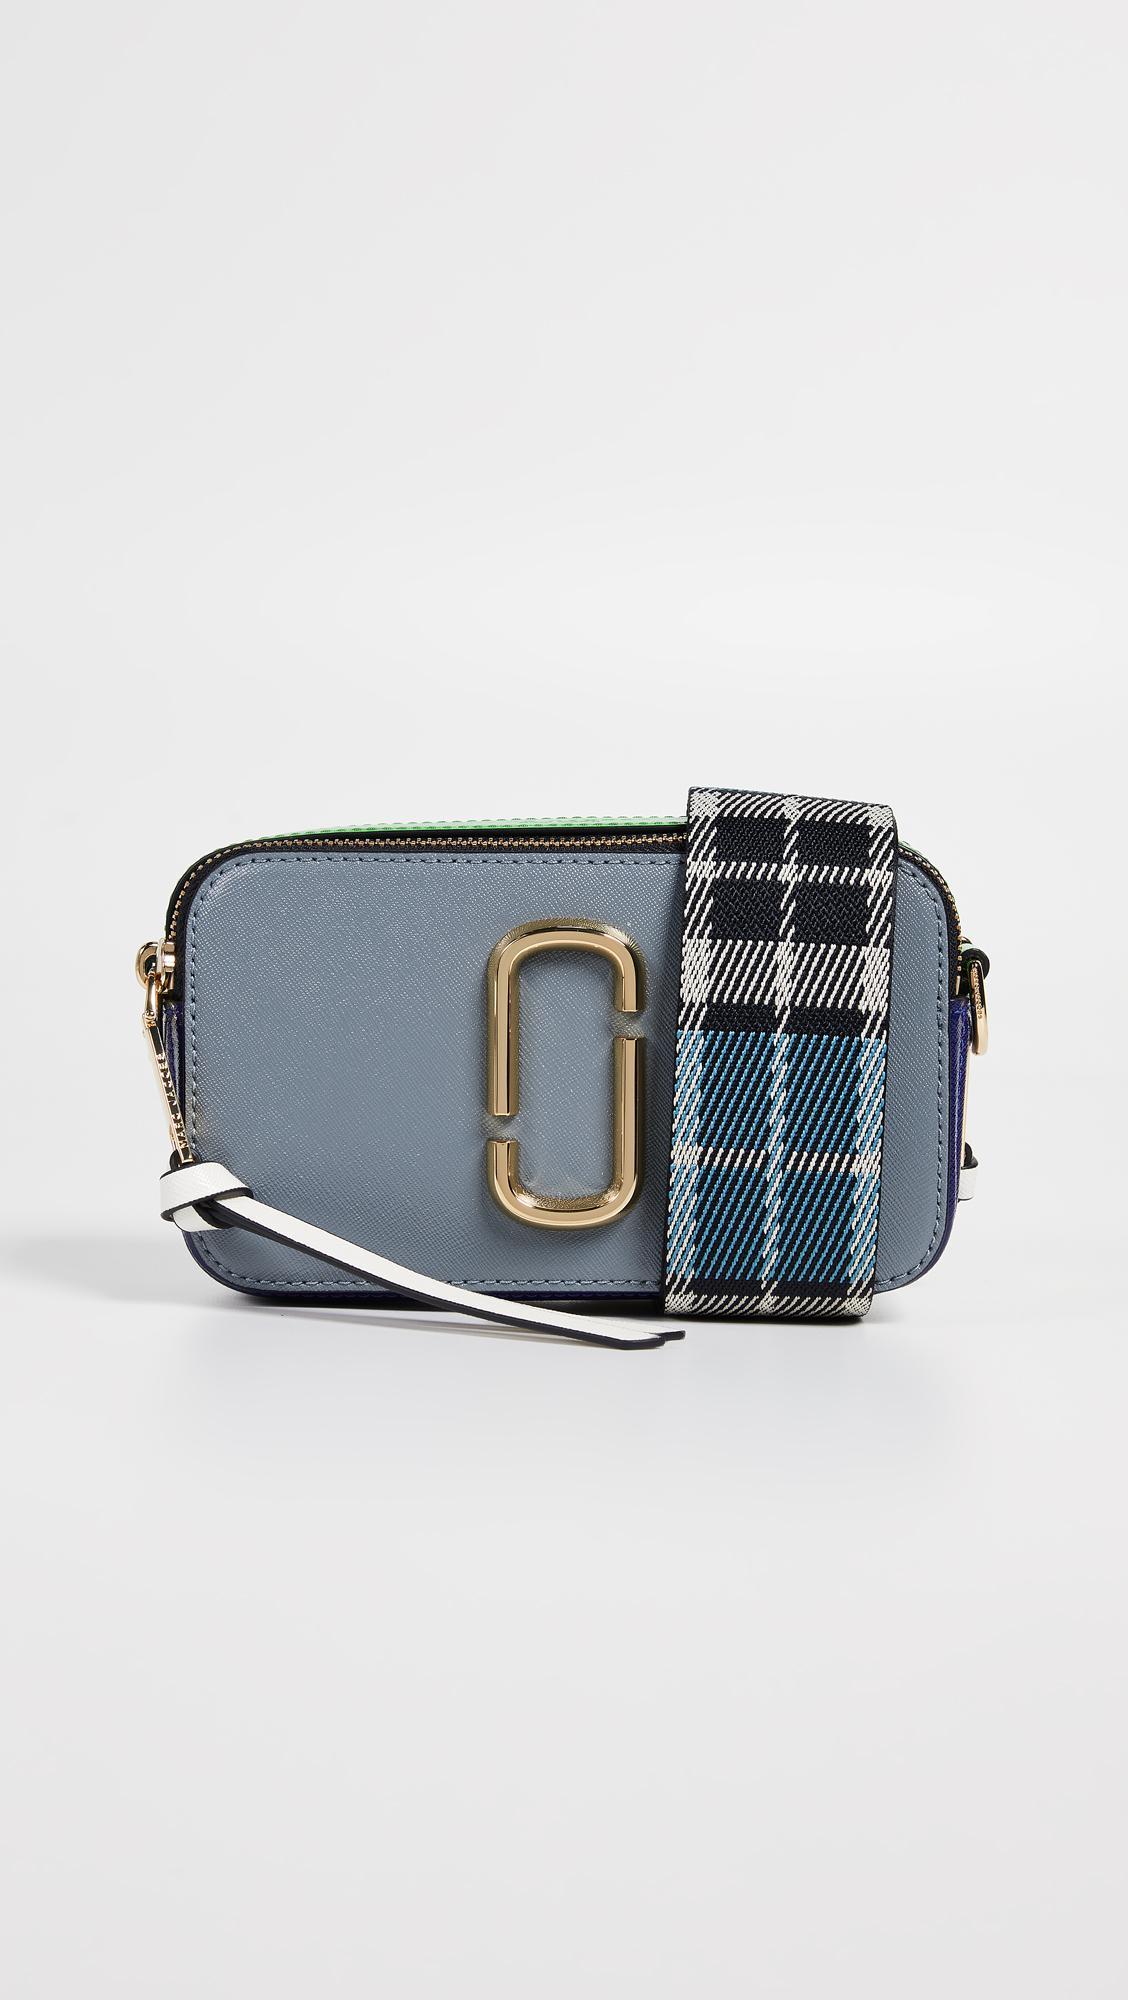 44bfcd4358c8 Marc Jacobs. Women s Snapshot Camera Bag